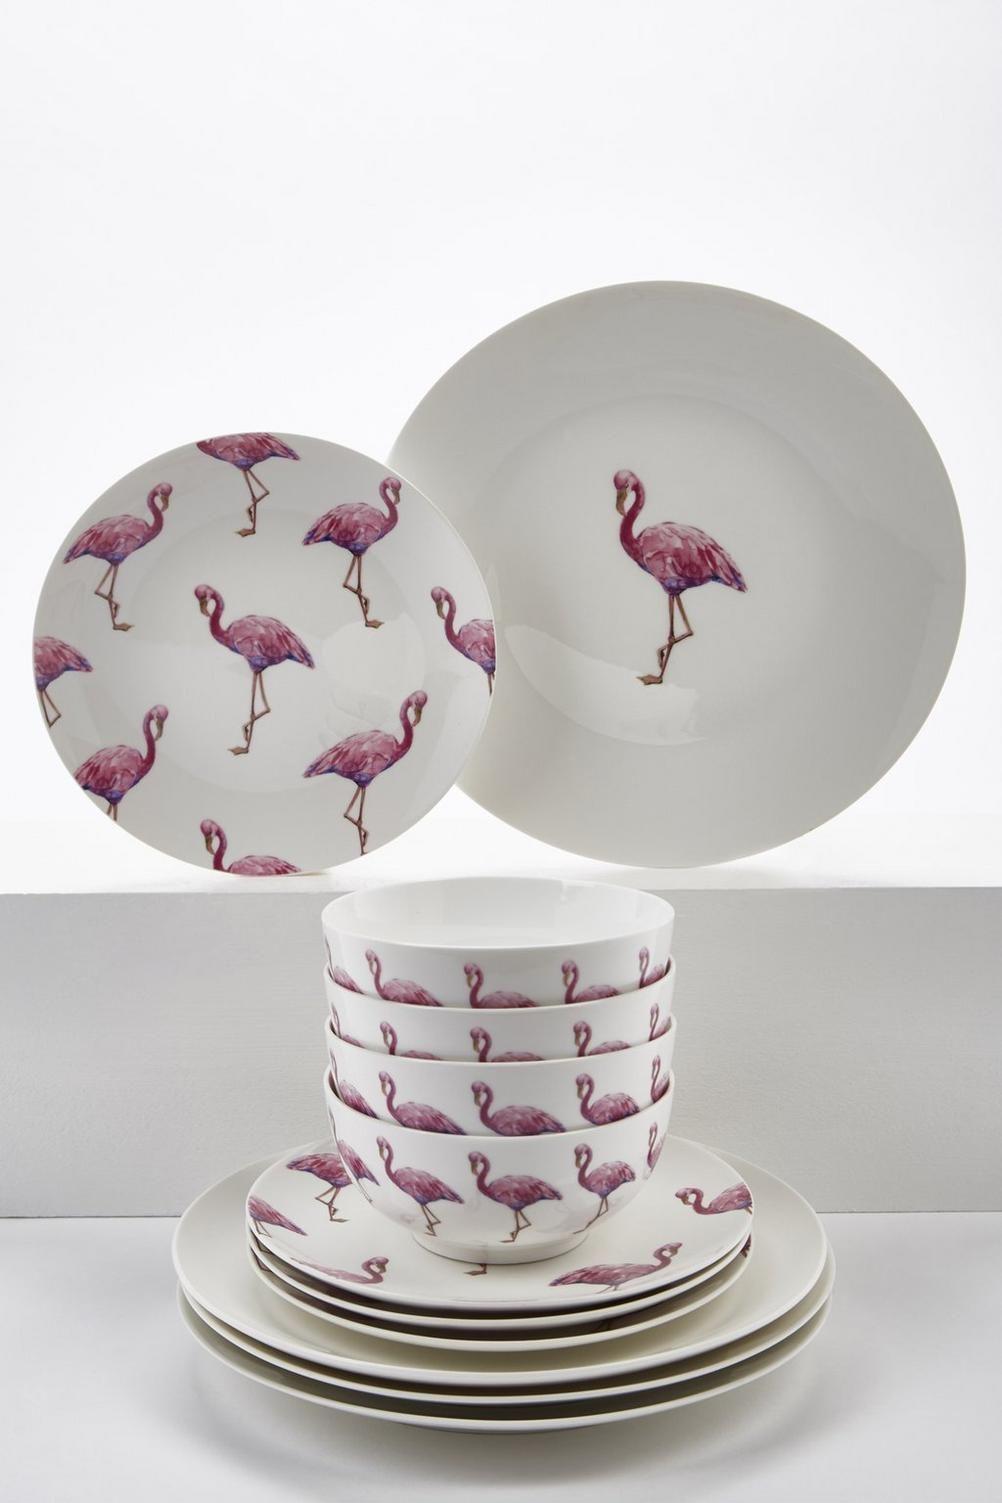 Image For 12 Piece New Bone China Pink Flamingo Dinner Set From Studio Flamingo Decor Pink Flamingos Flamingo [ 1503 x 1002 Pixel ]